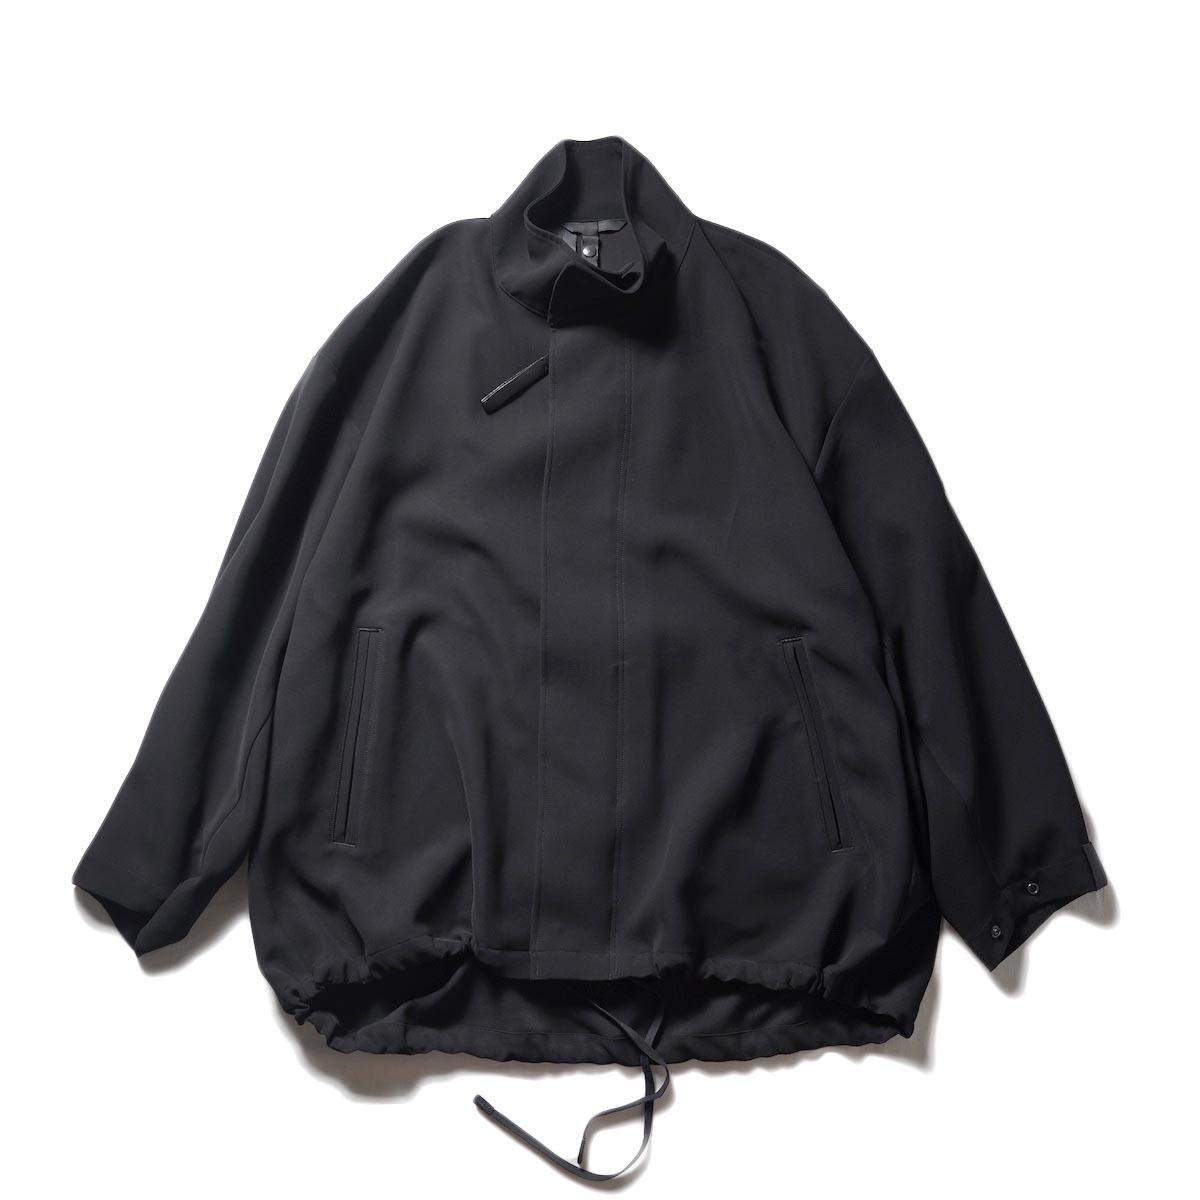 N.HOOLYWOOD / 2212-BL02-098 peg STAND COLLAR BLOUSON (Black)